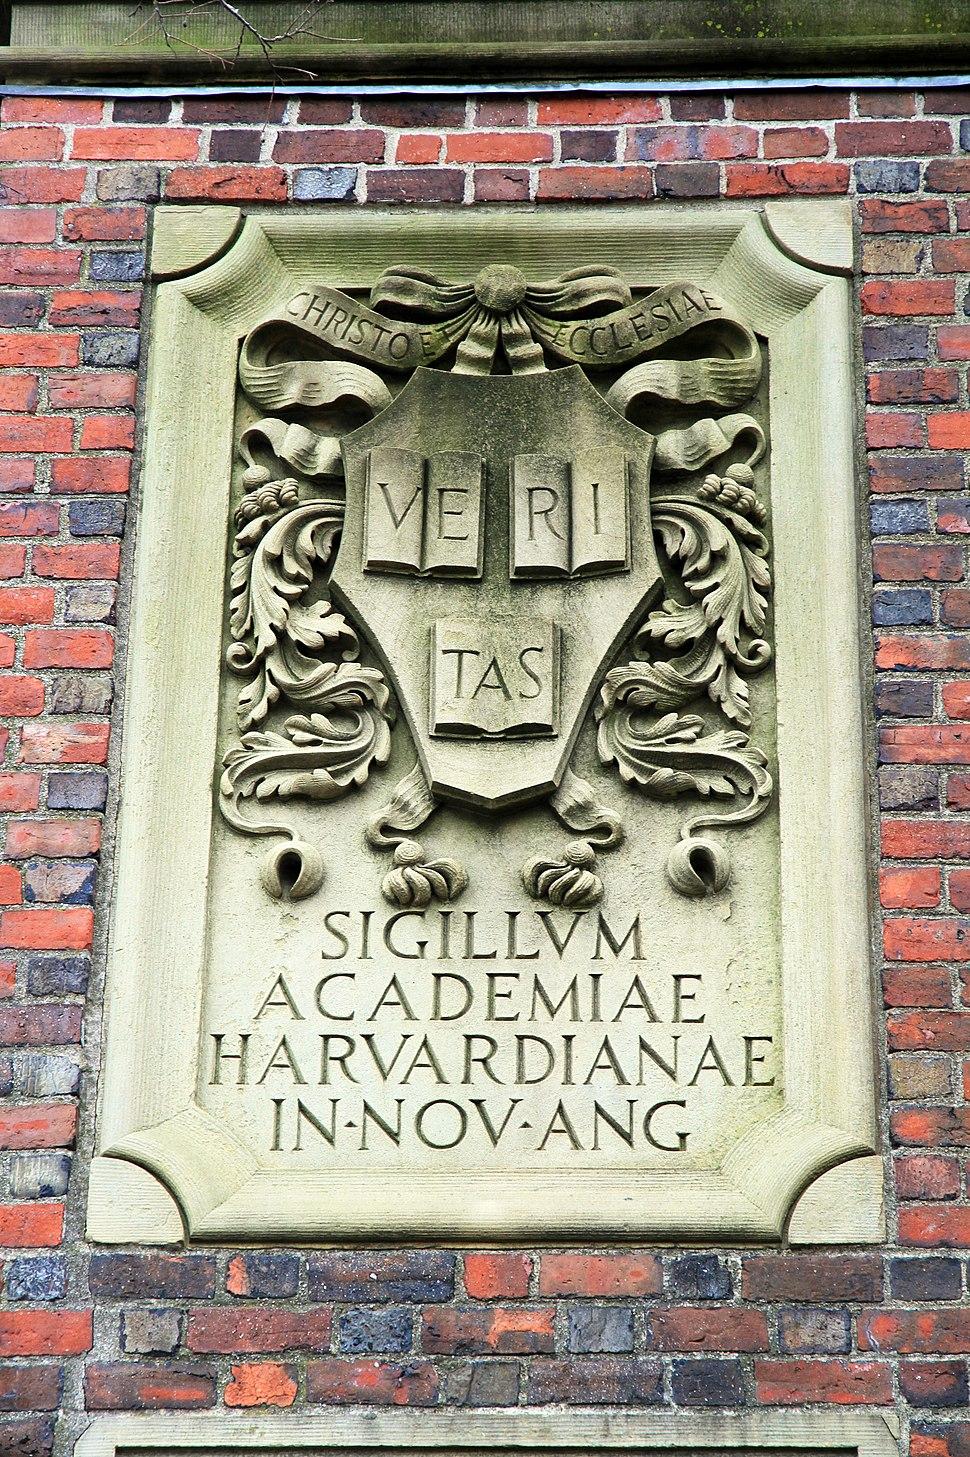 USA-Harvard University